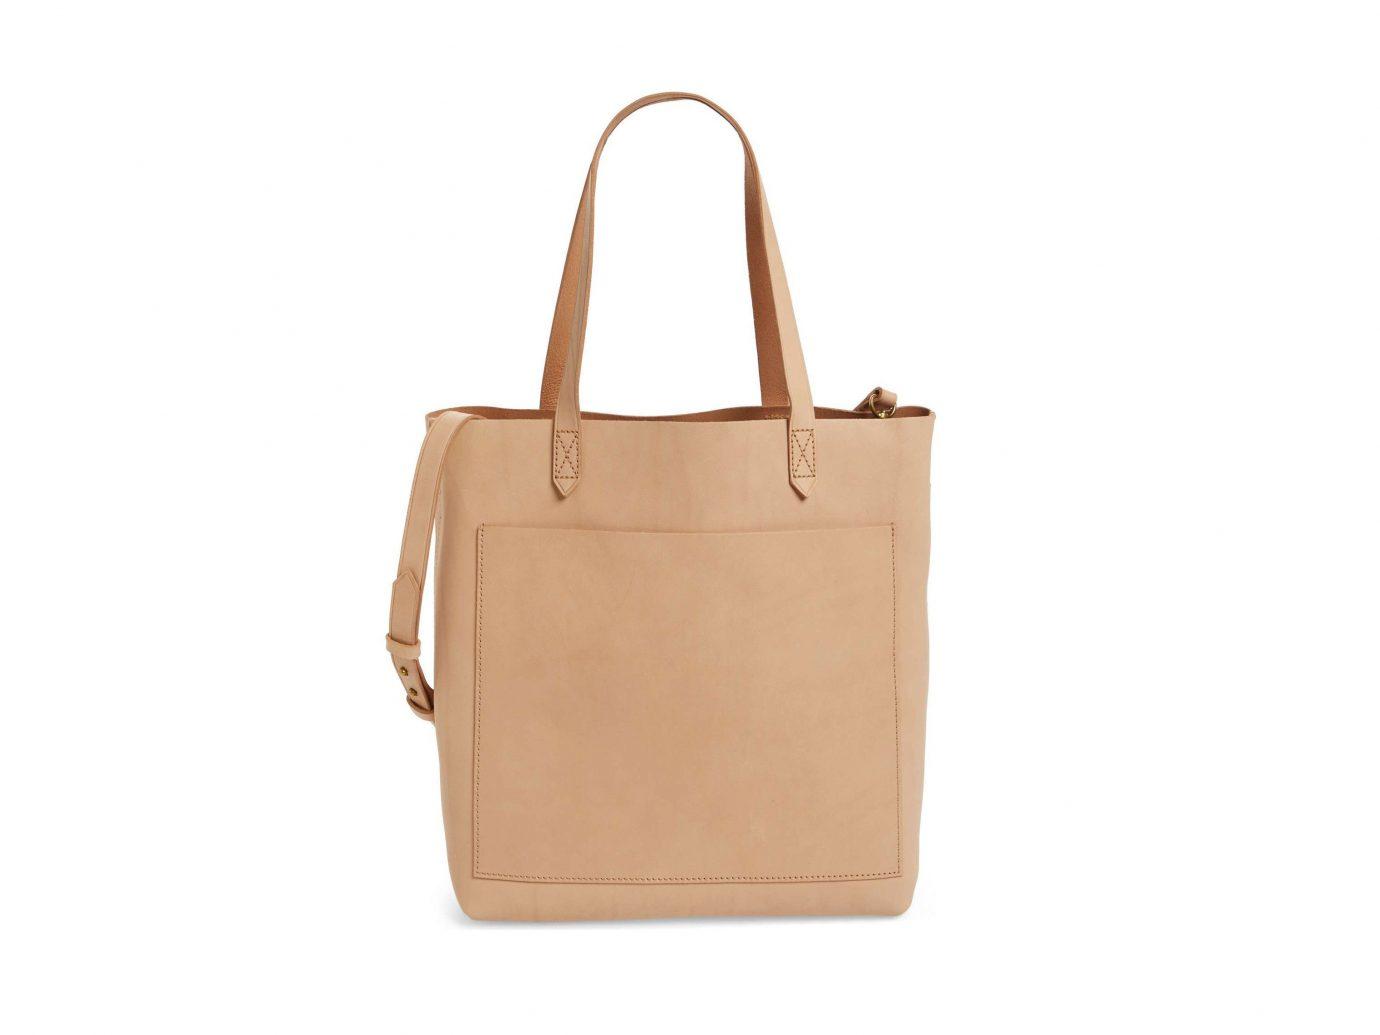 europe Hotels Prague accessory case bag handbag brown shoulder bag beige fashion accessory product leather caramel color tote bag product design peach brand